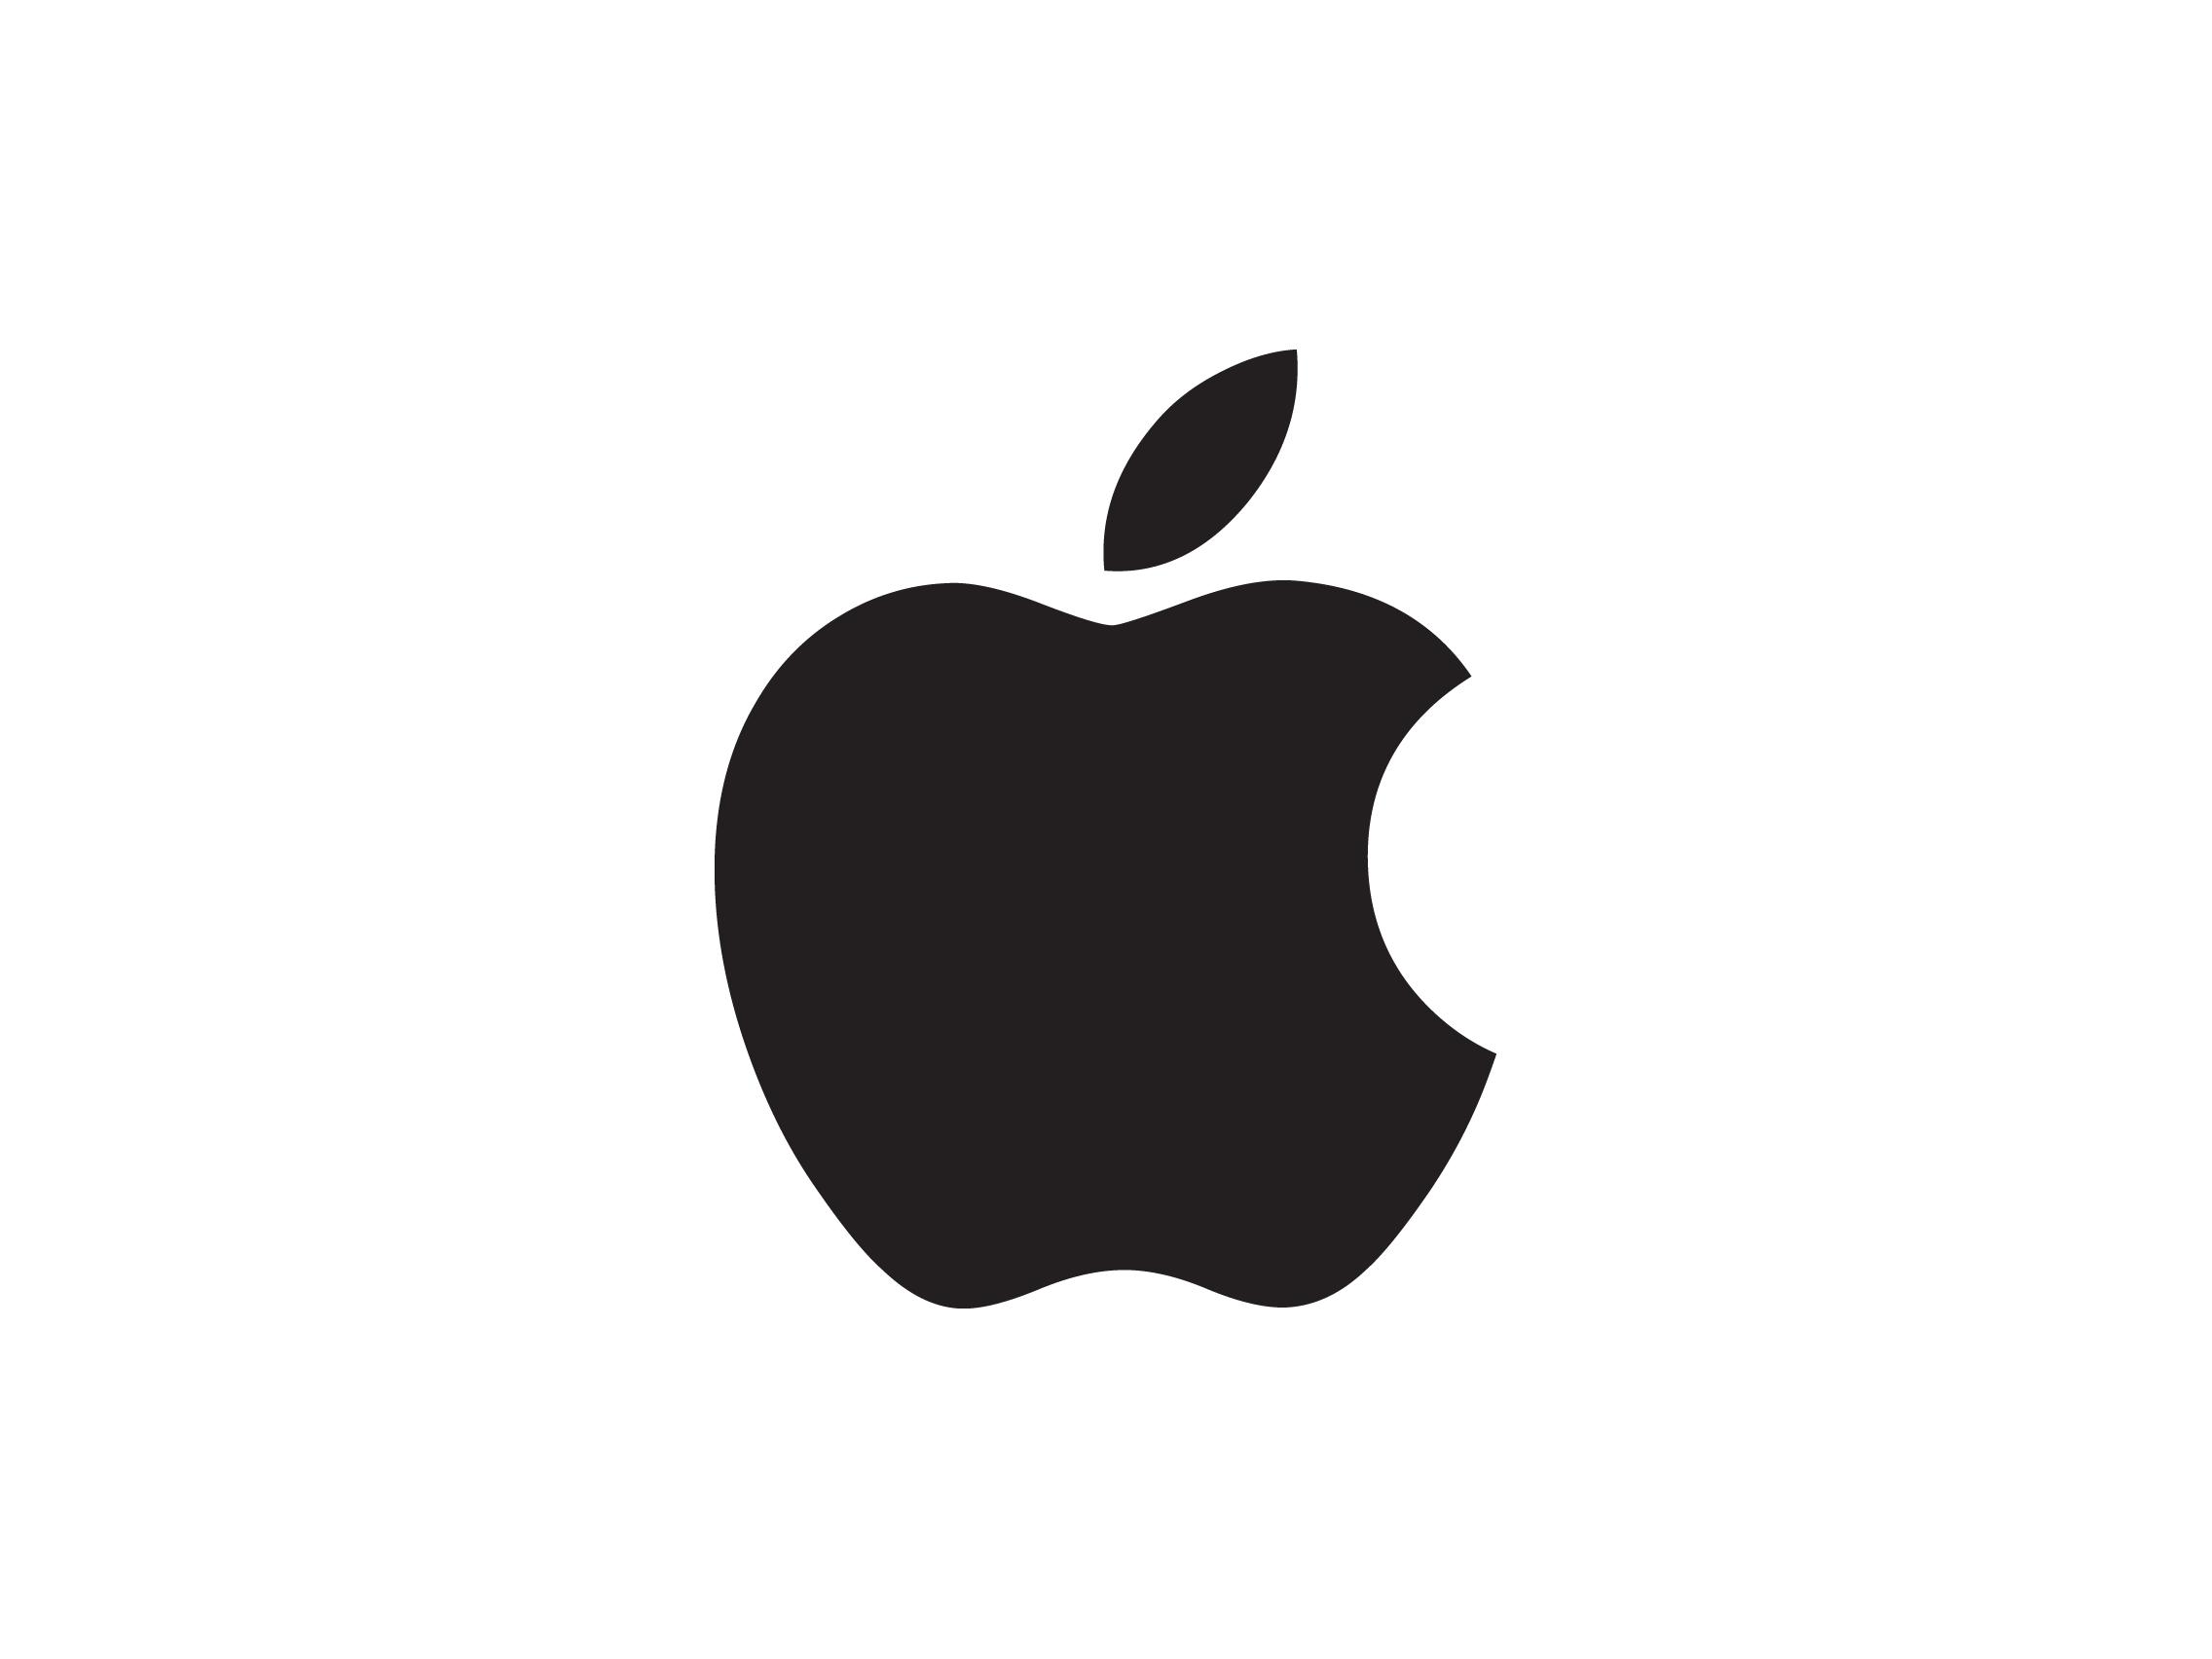 Black Apple Clothing Brand